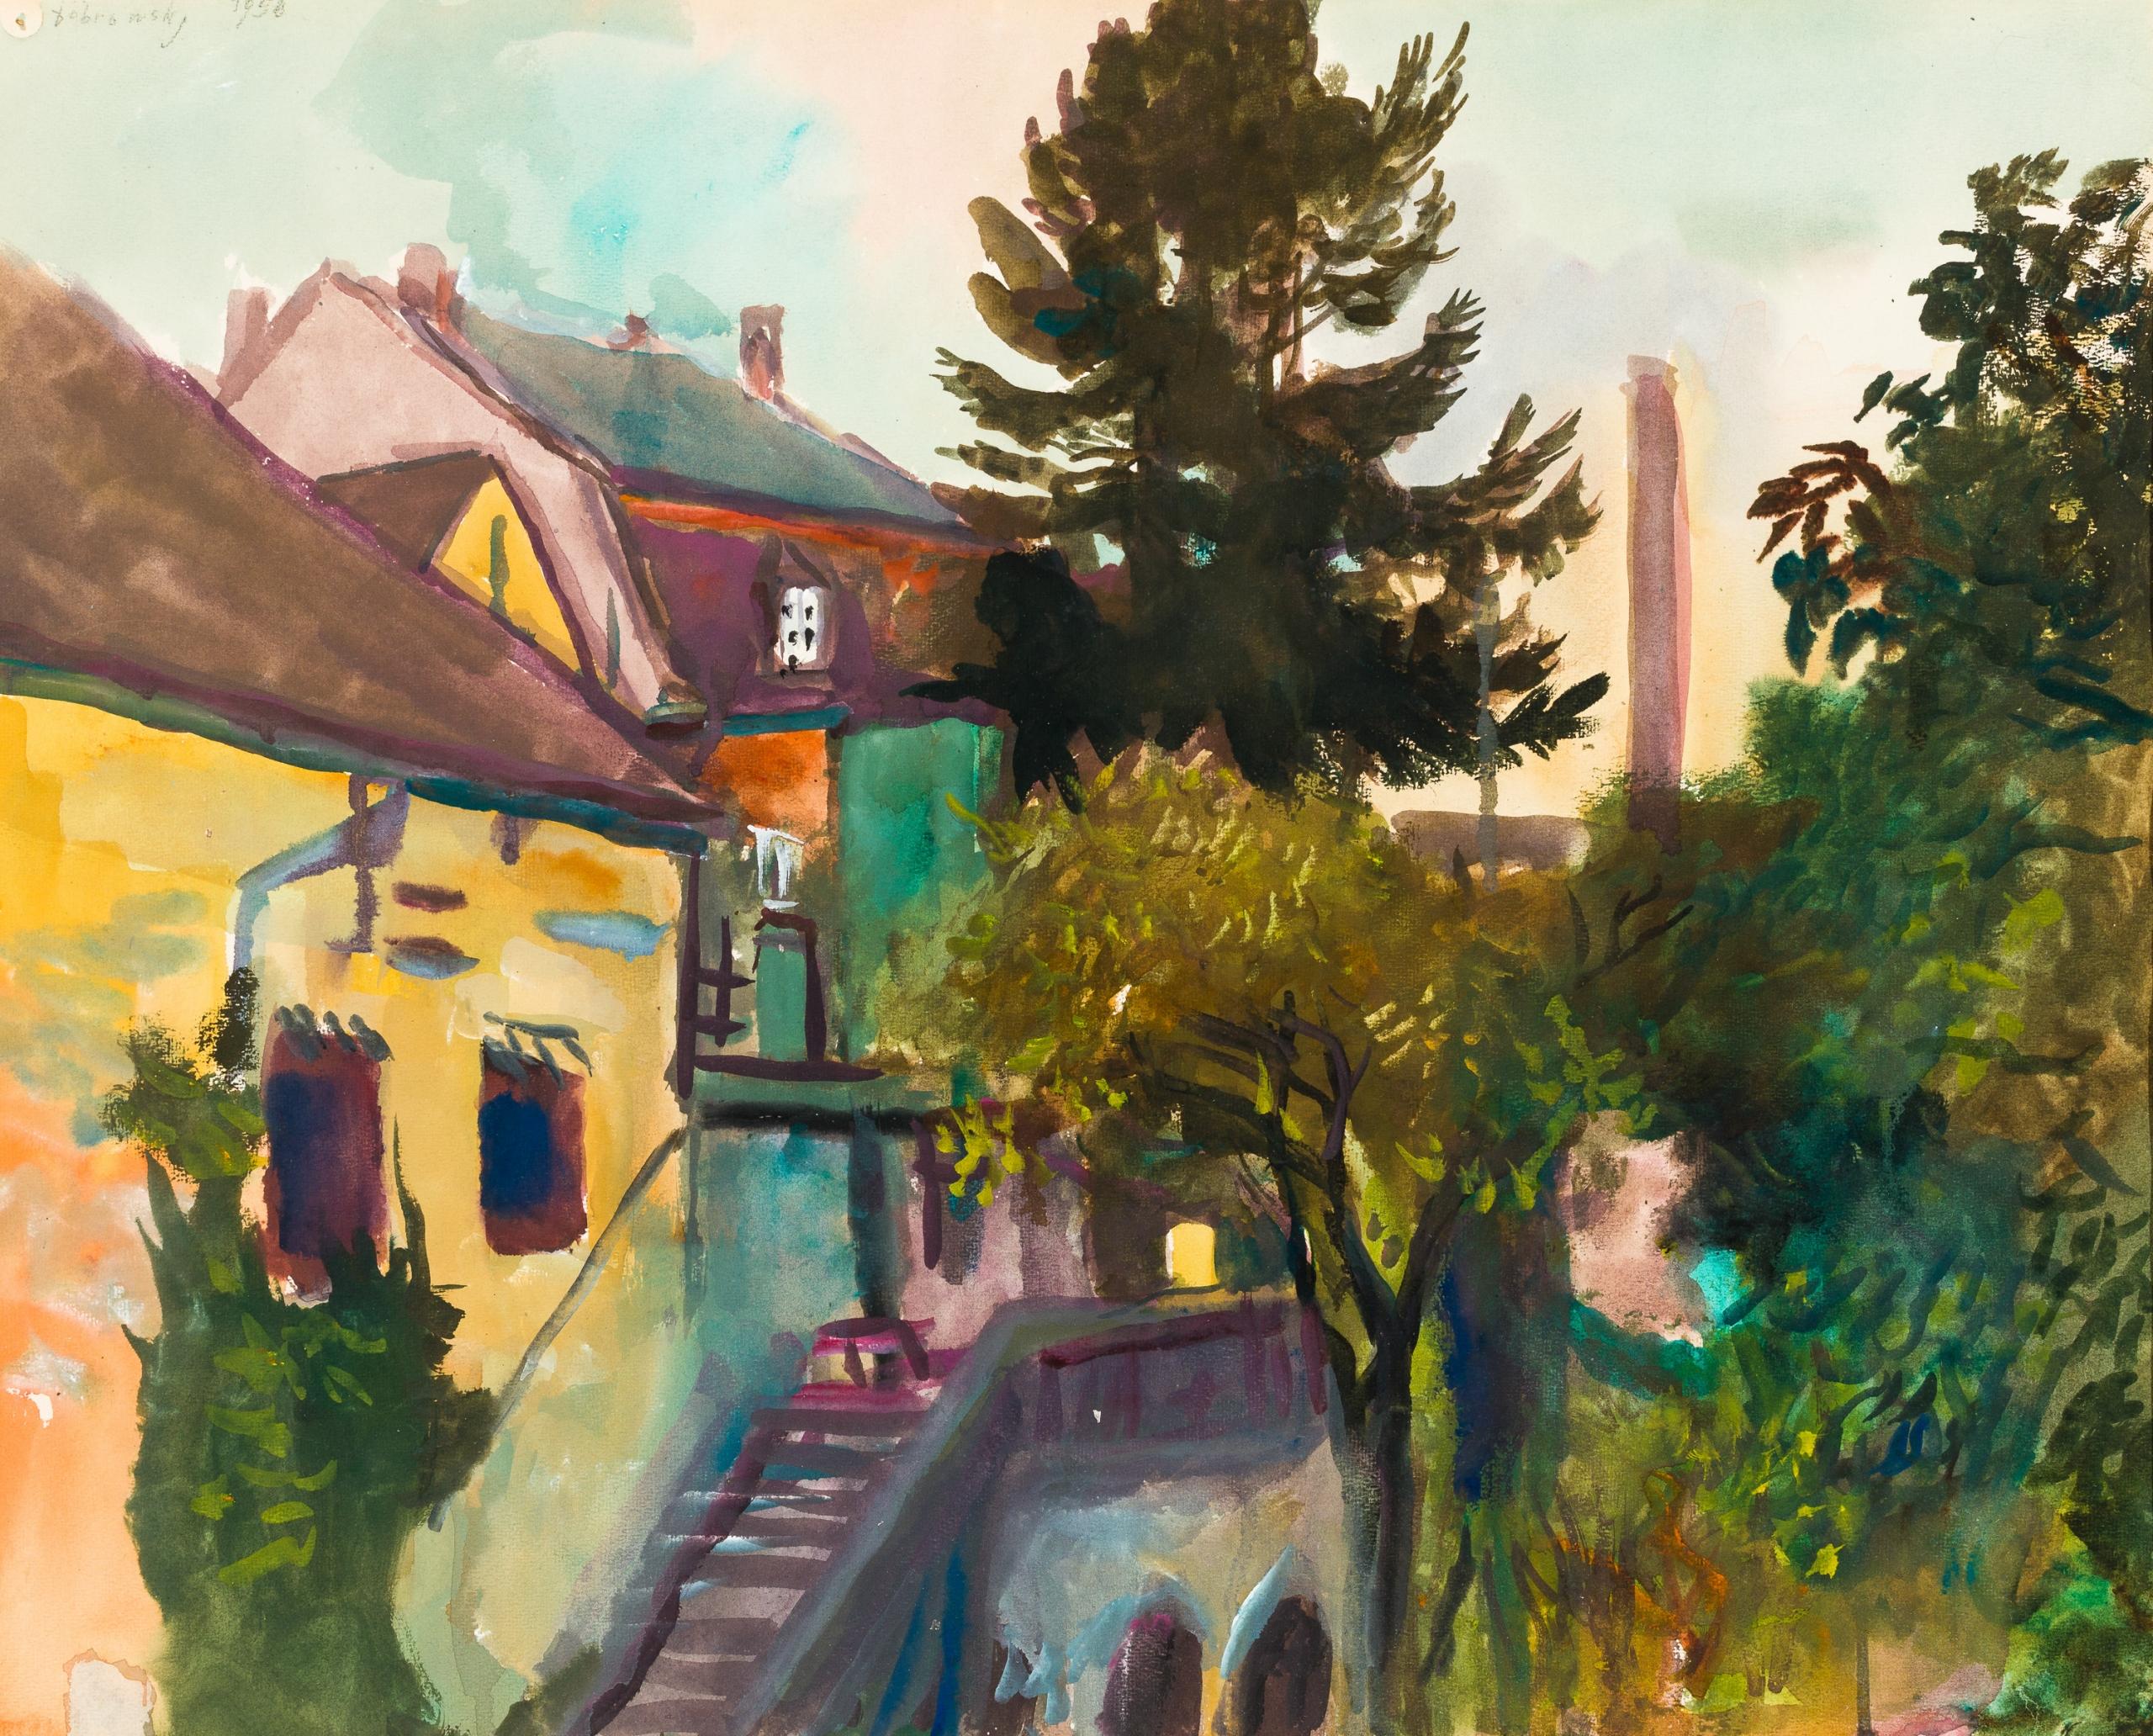 Josef Dobrowsky, Burggraben - Ybbs a.d. Donau